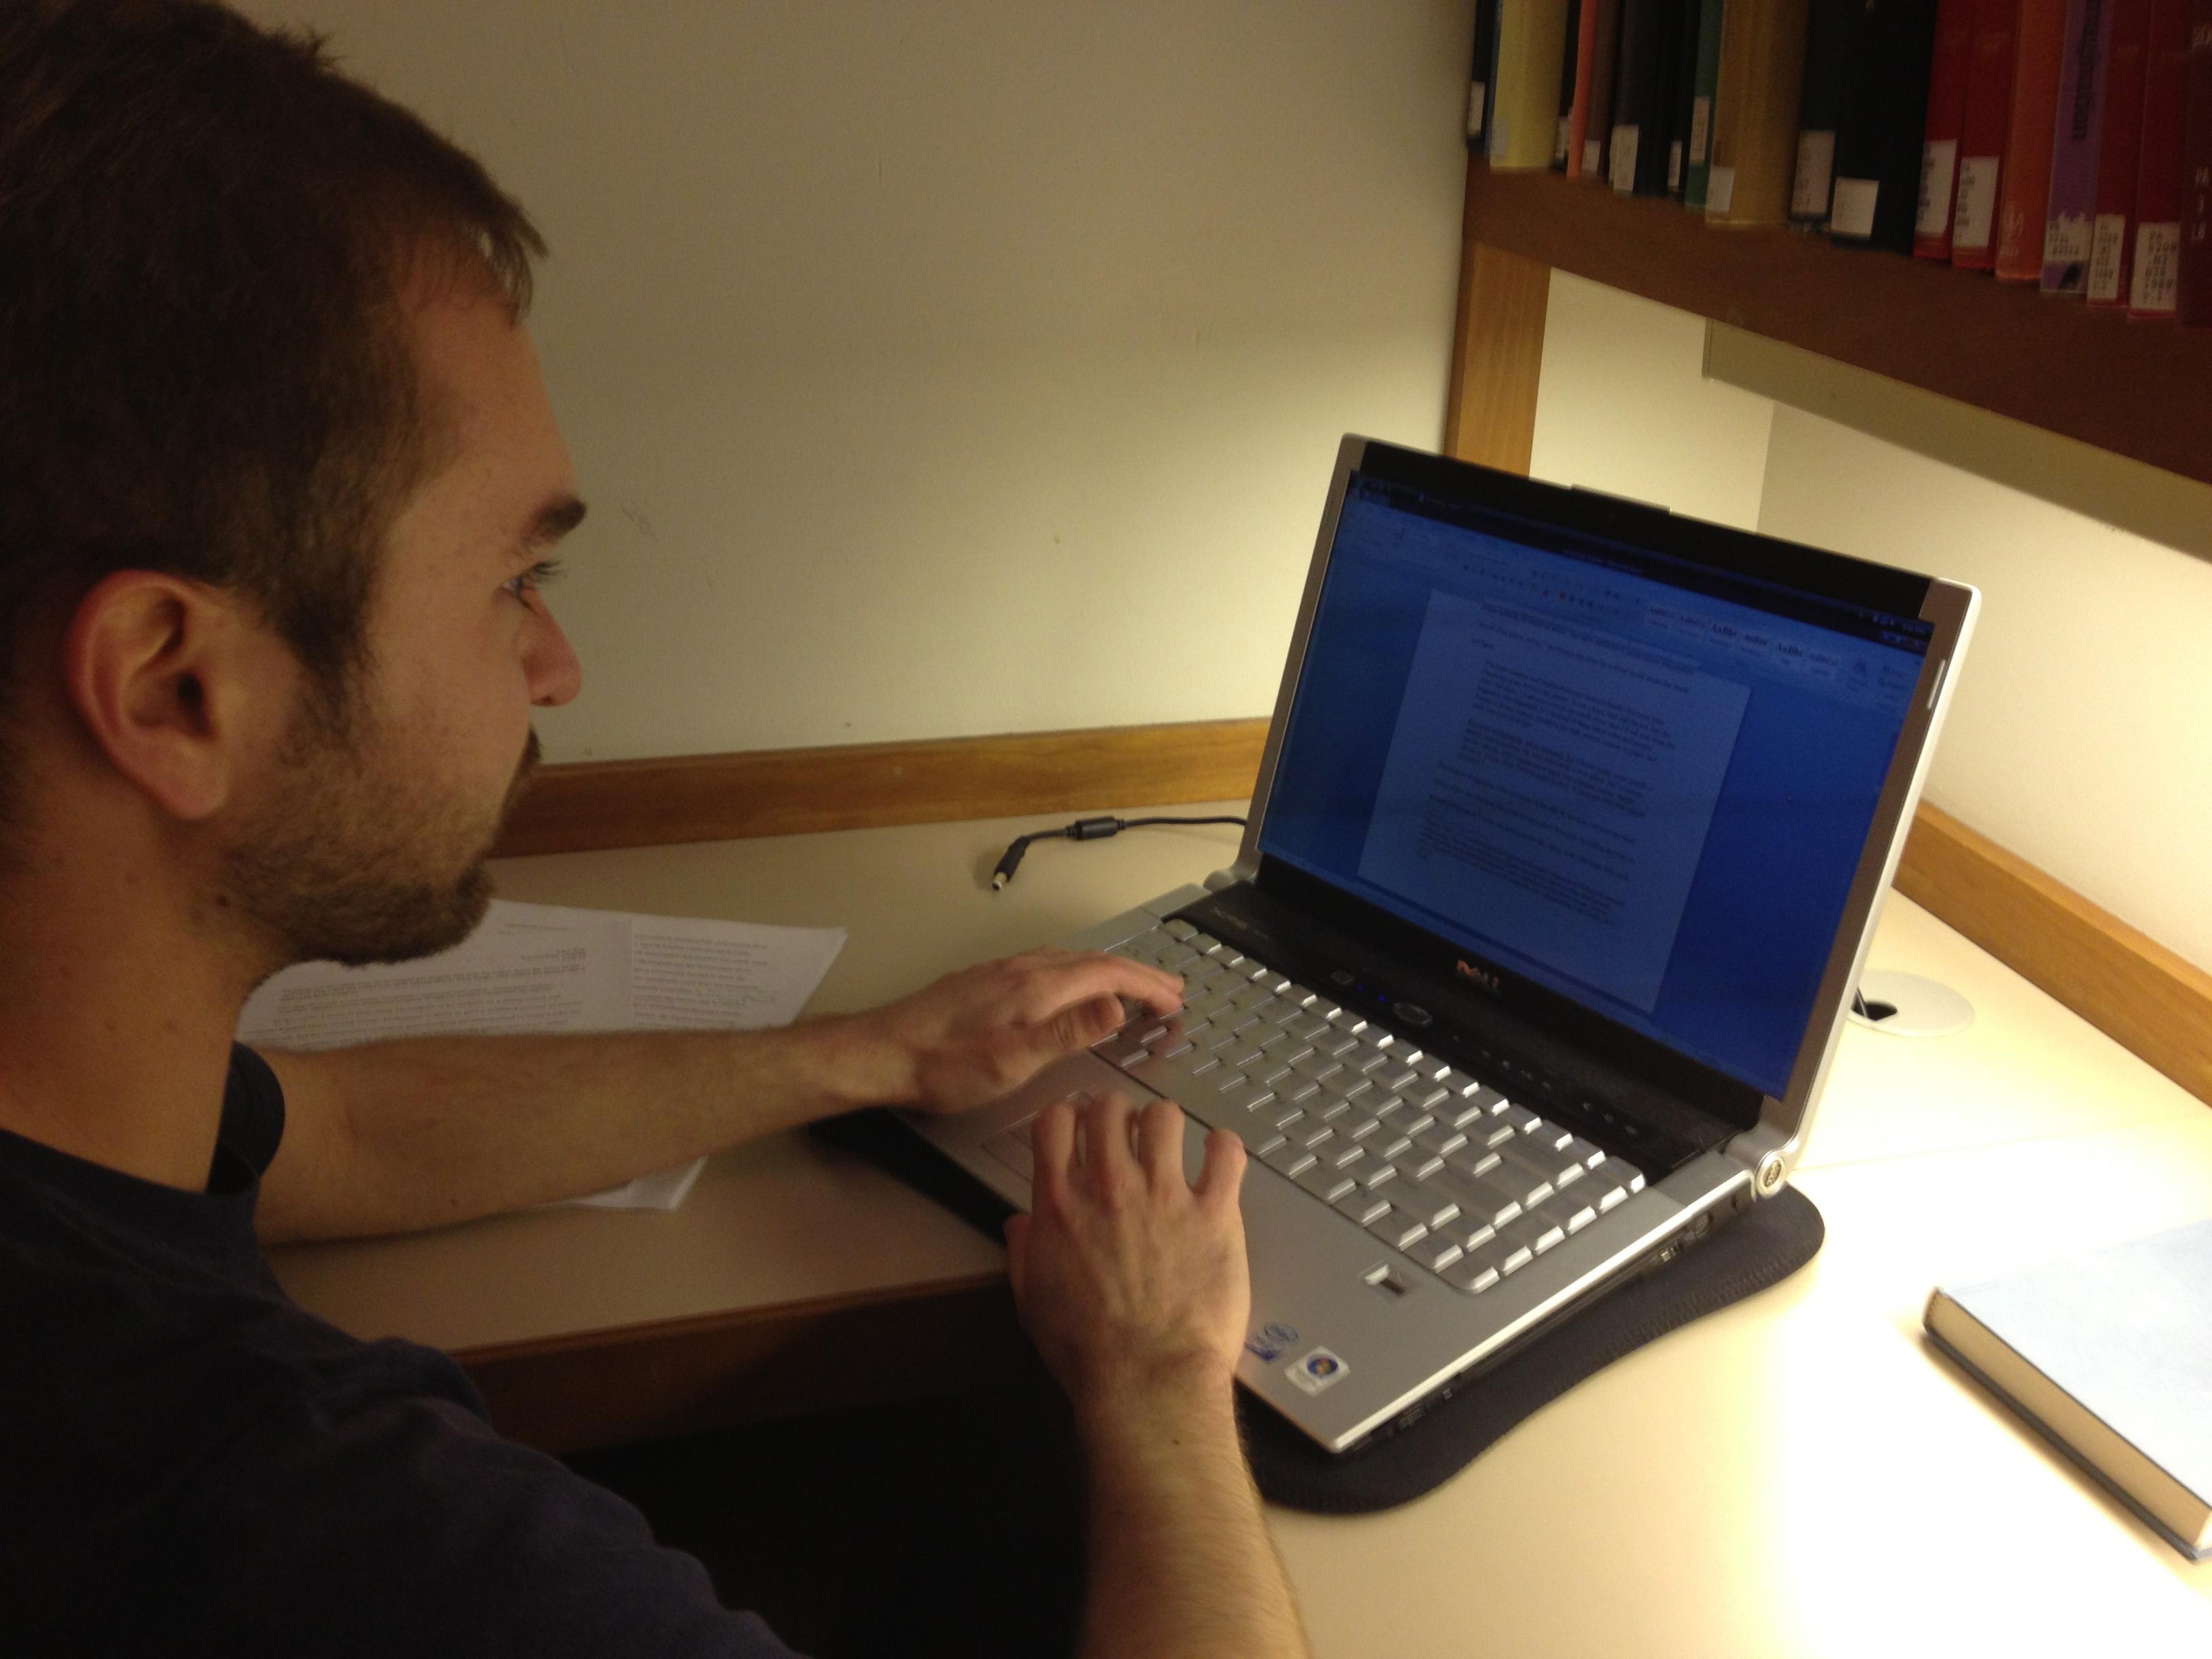 Creative writing minor cu denver